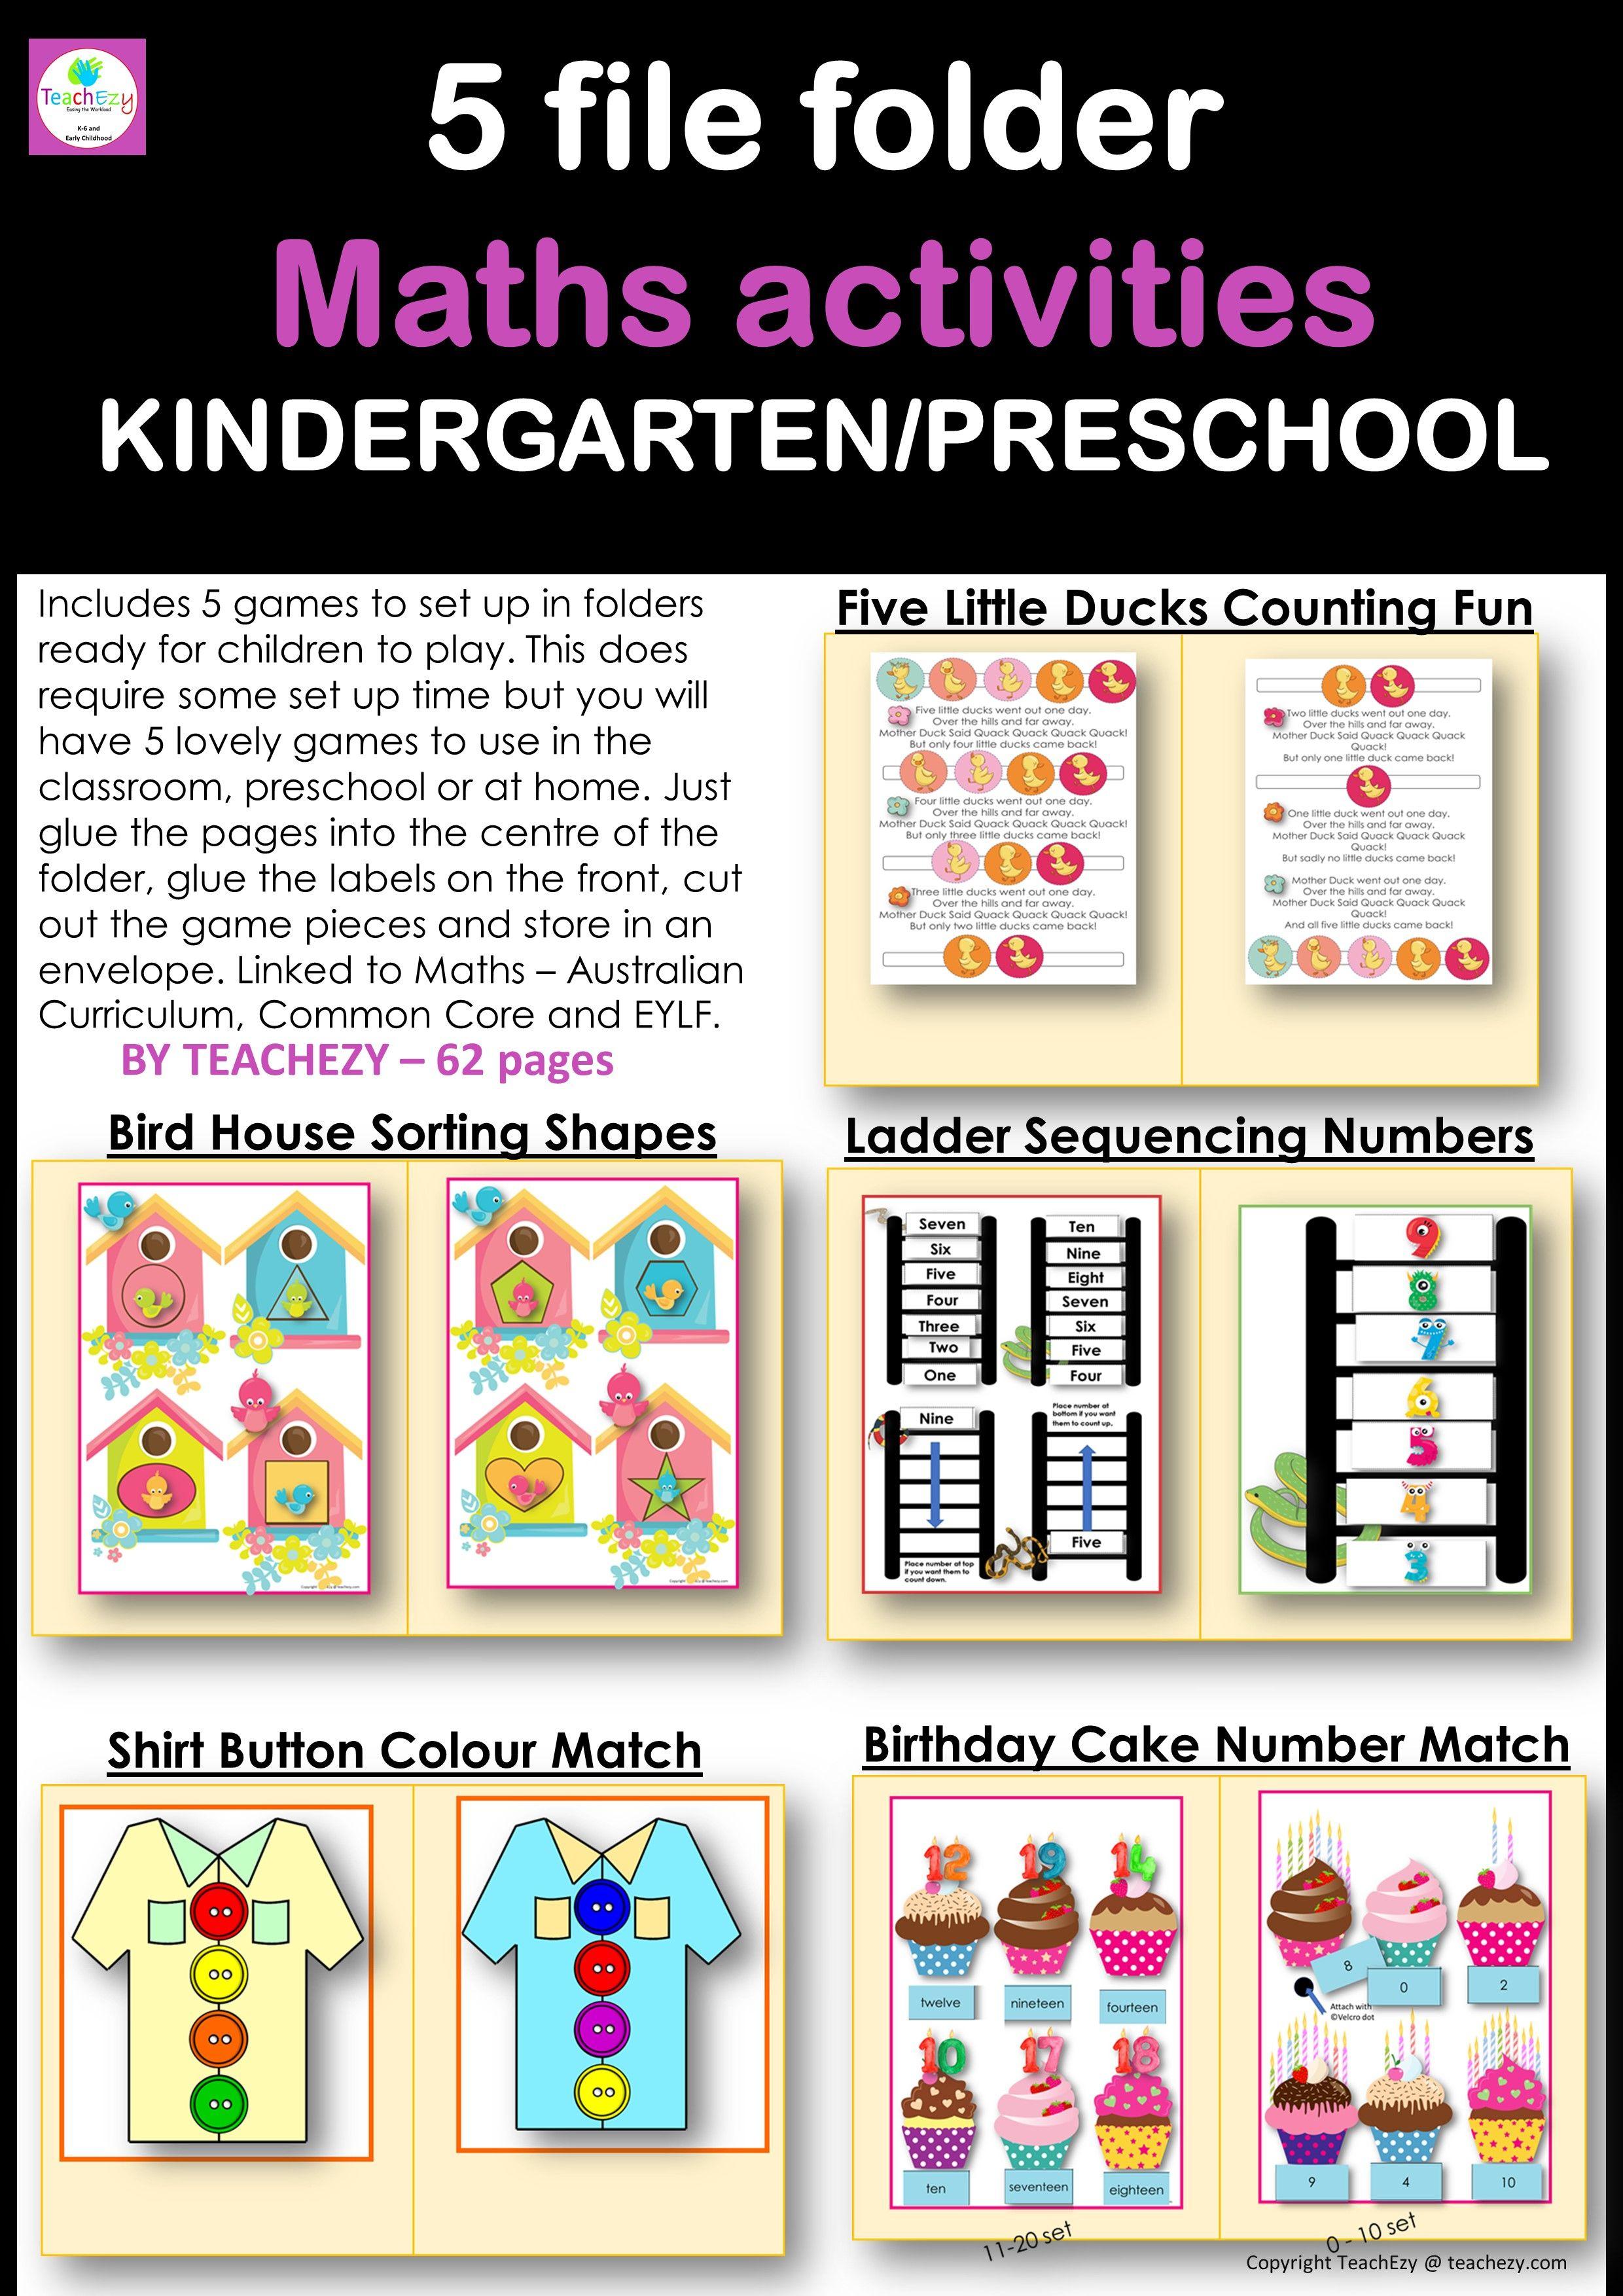 teaching resources shop Math activities preschool